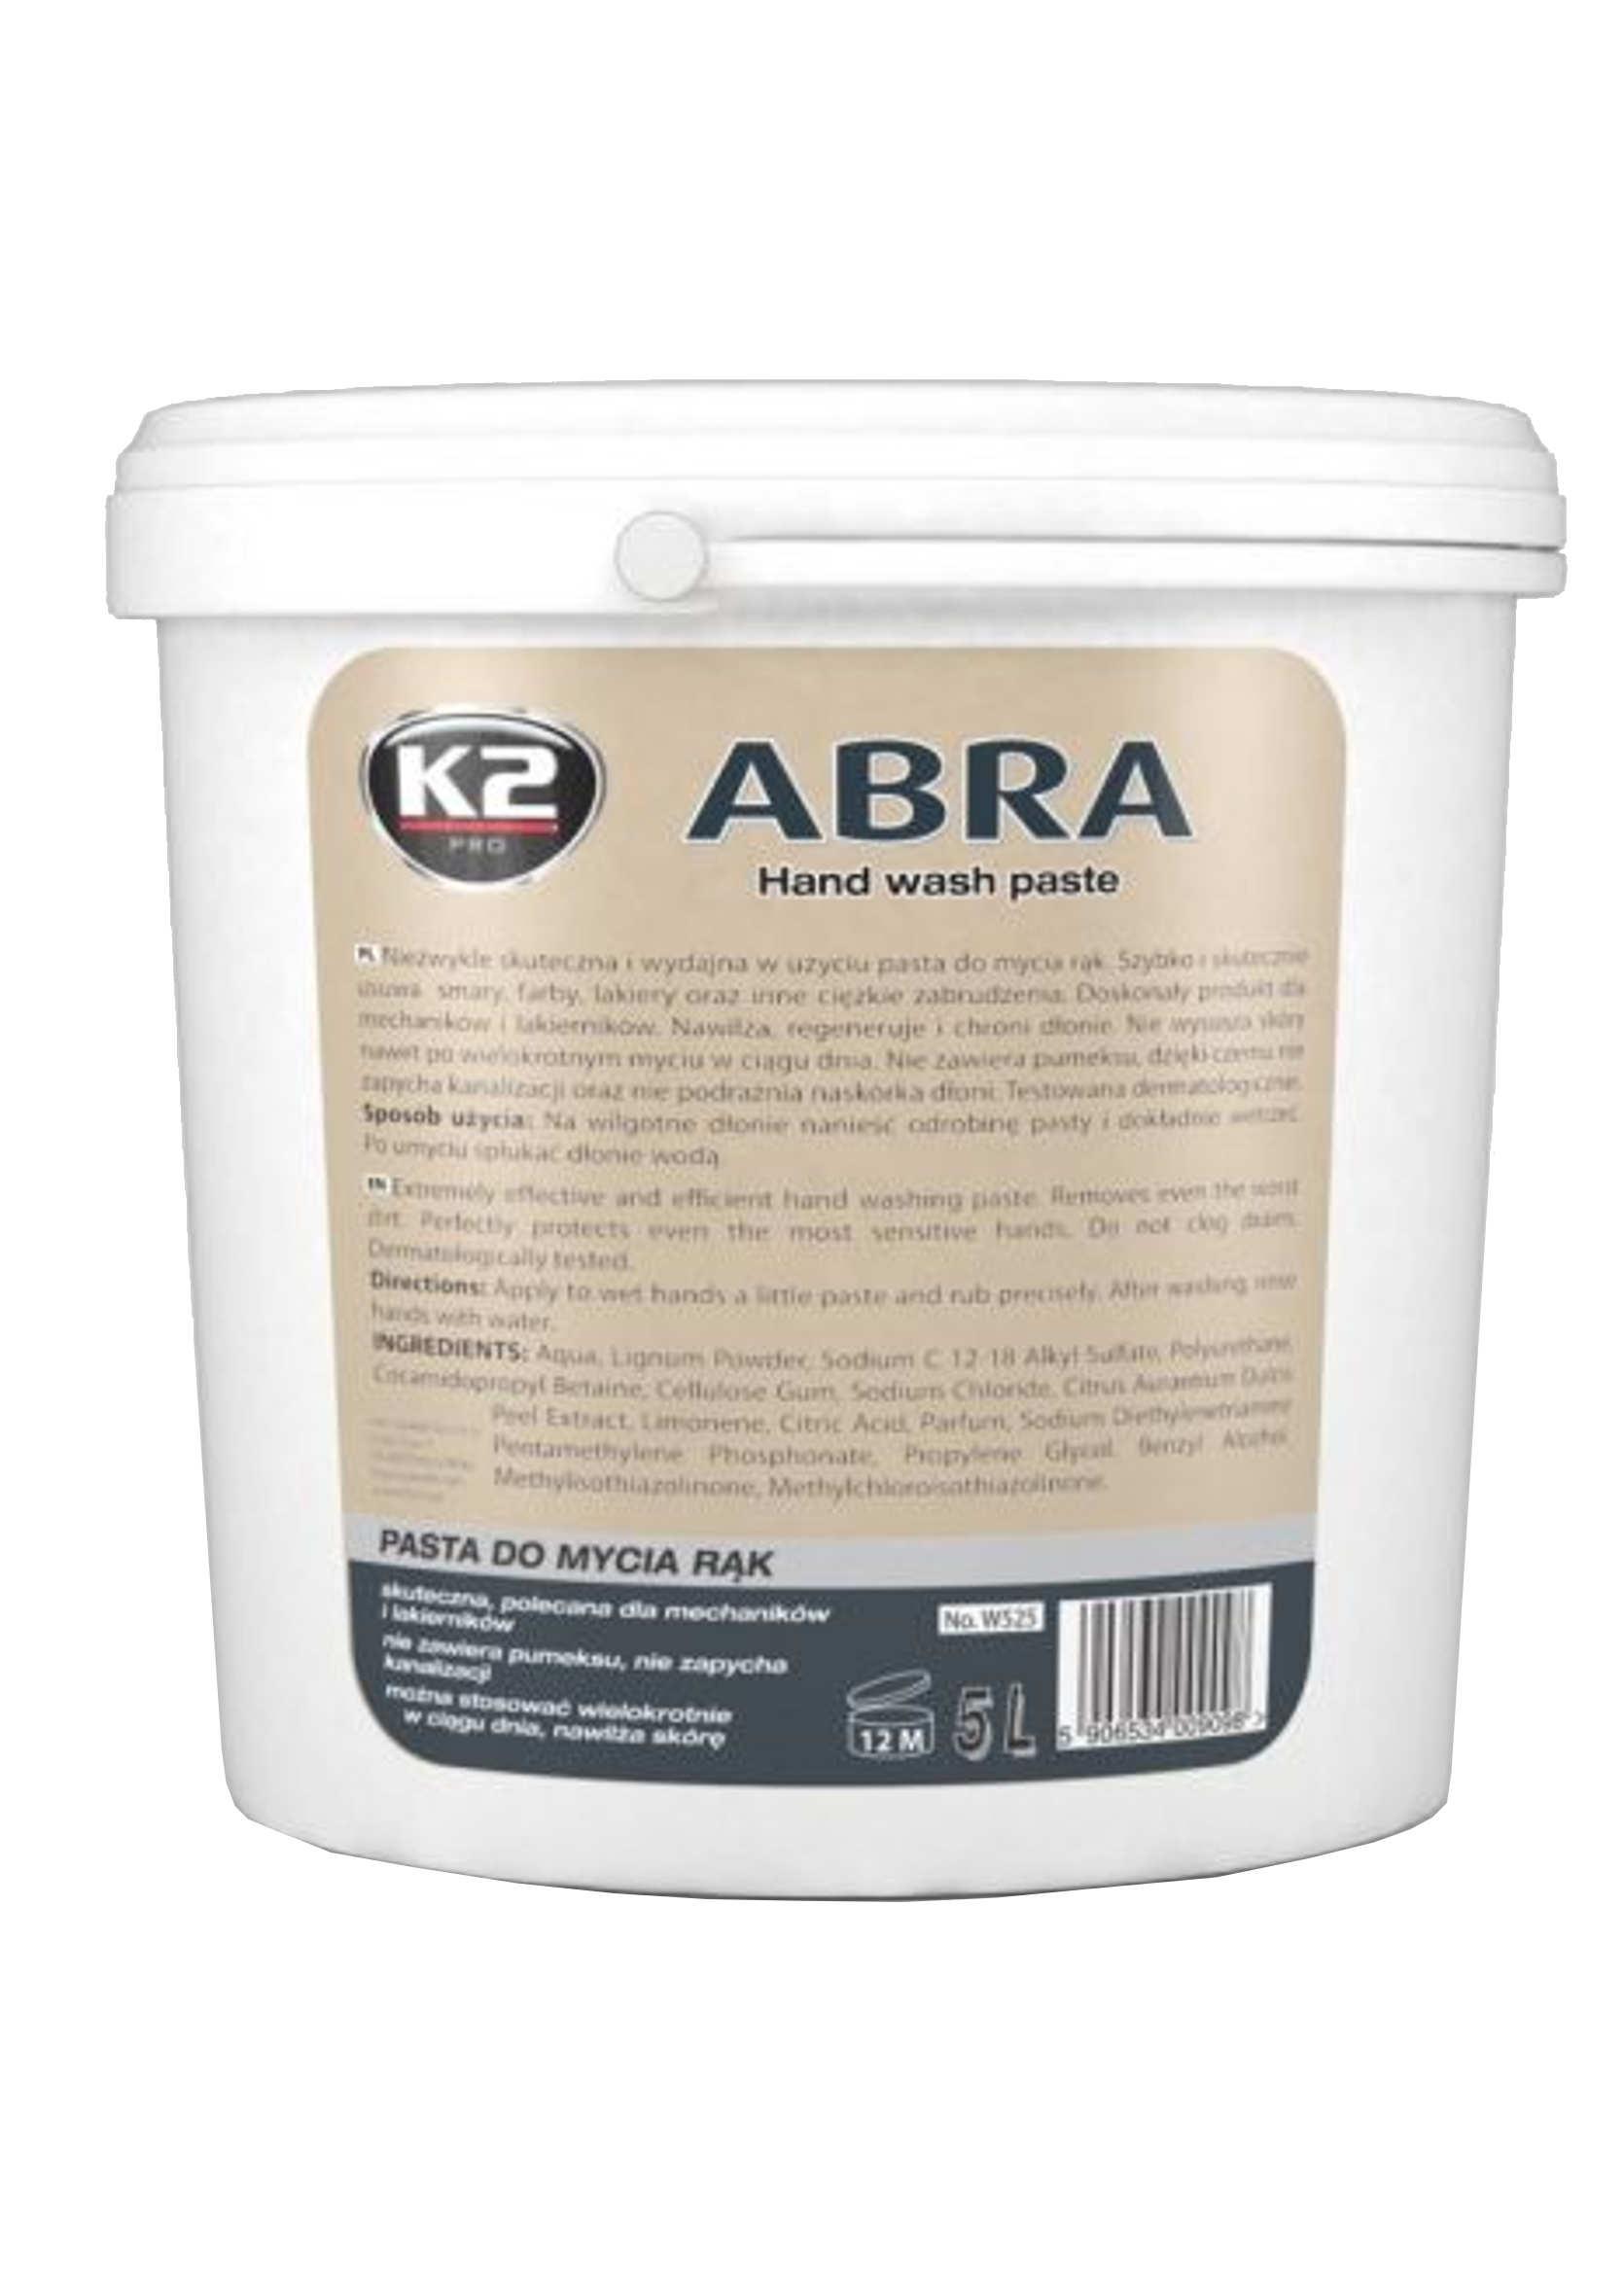 K2 Abra Pasta (jak BHP) do mycia rąk 5L